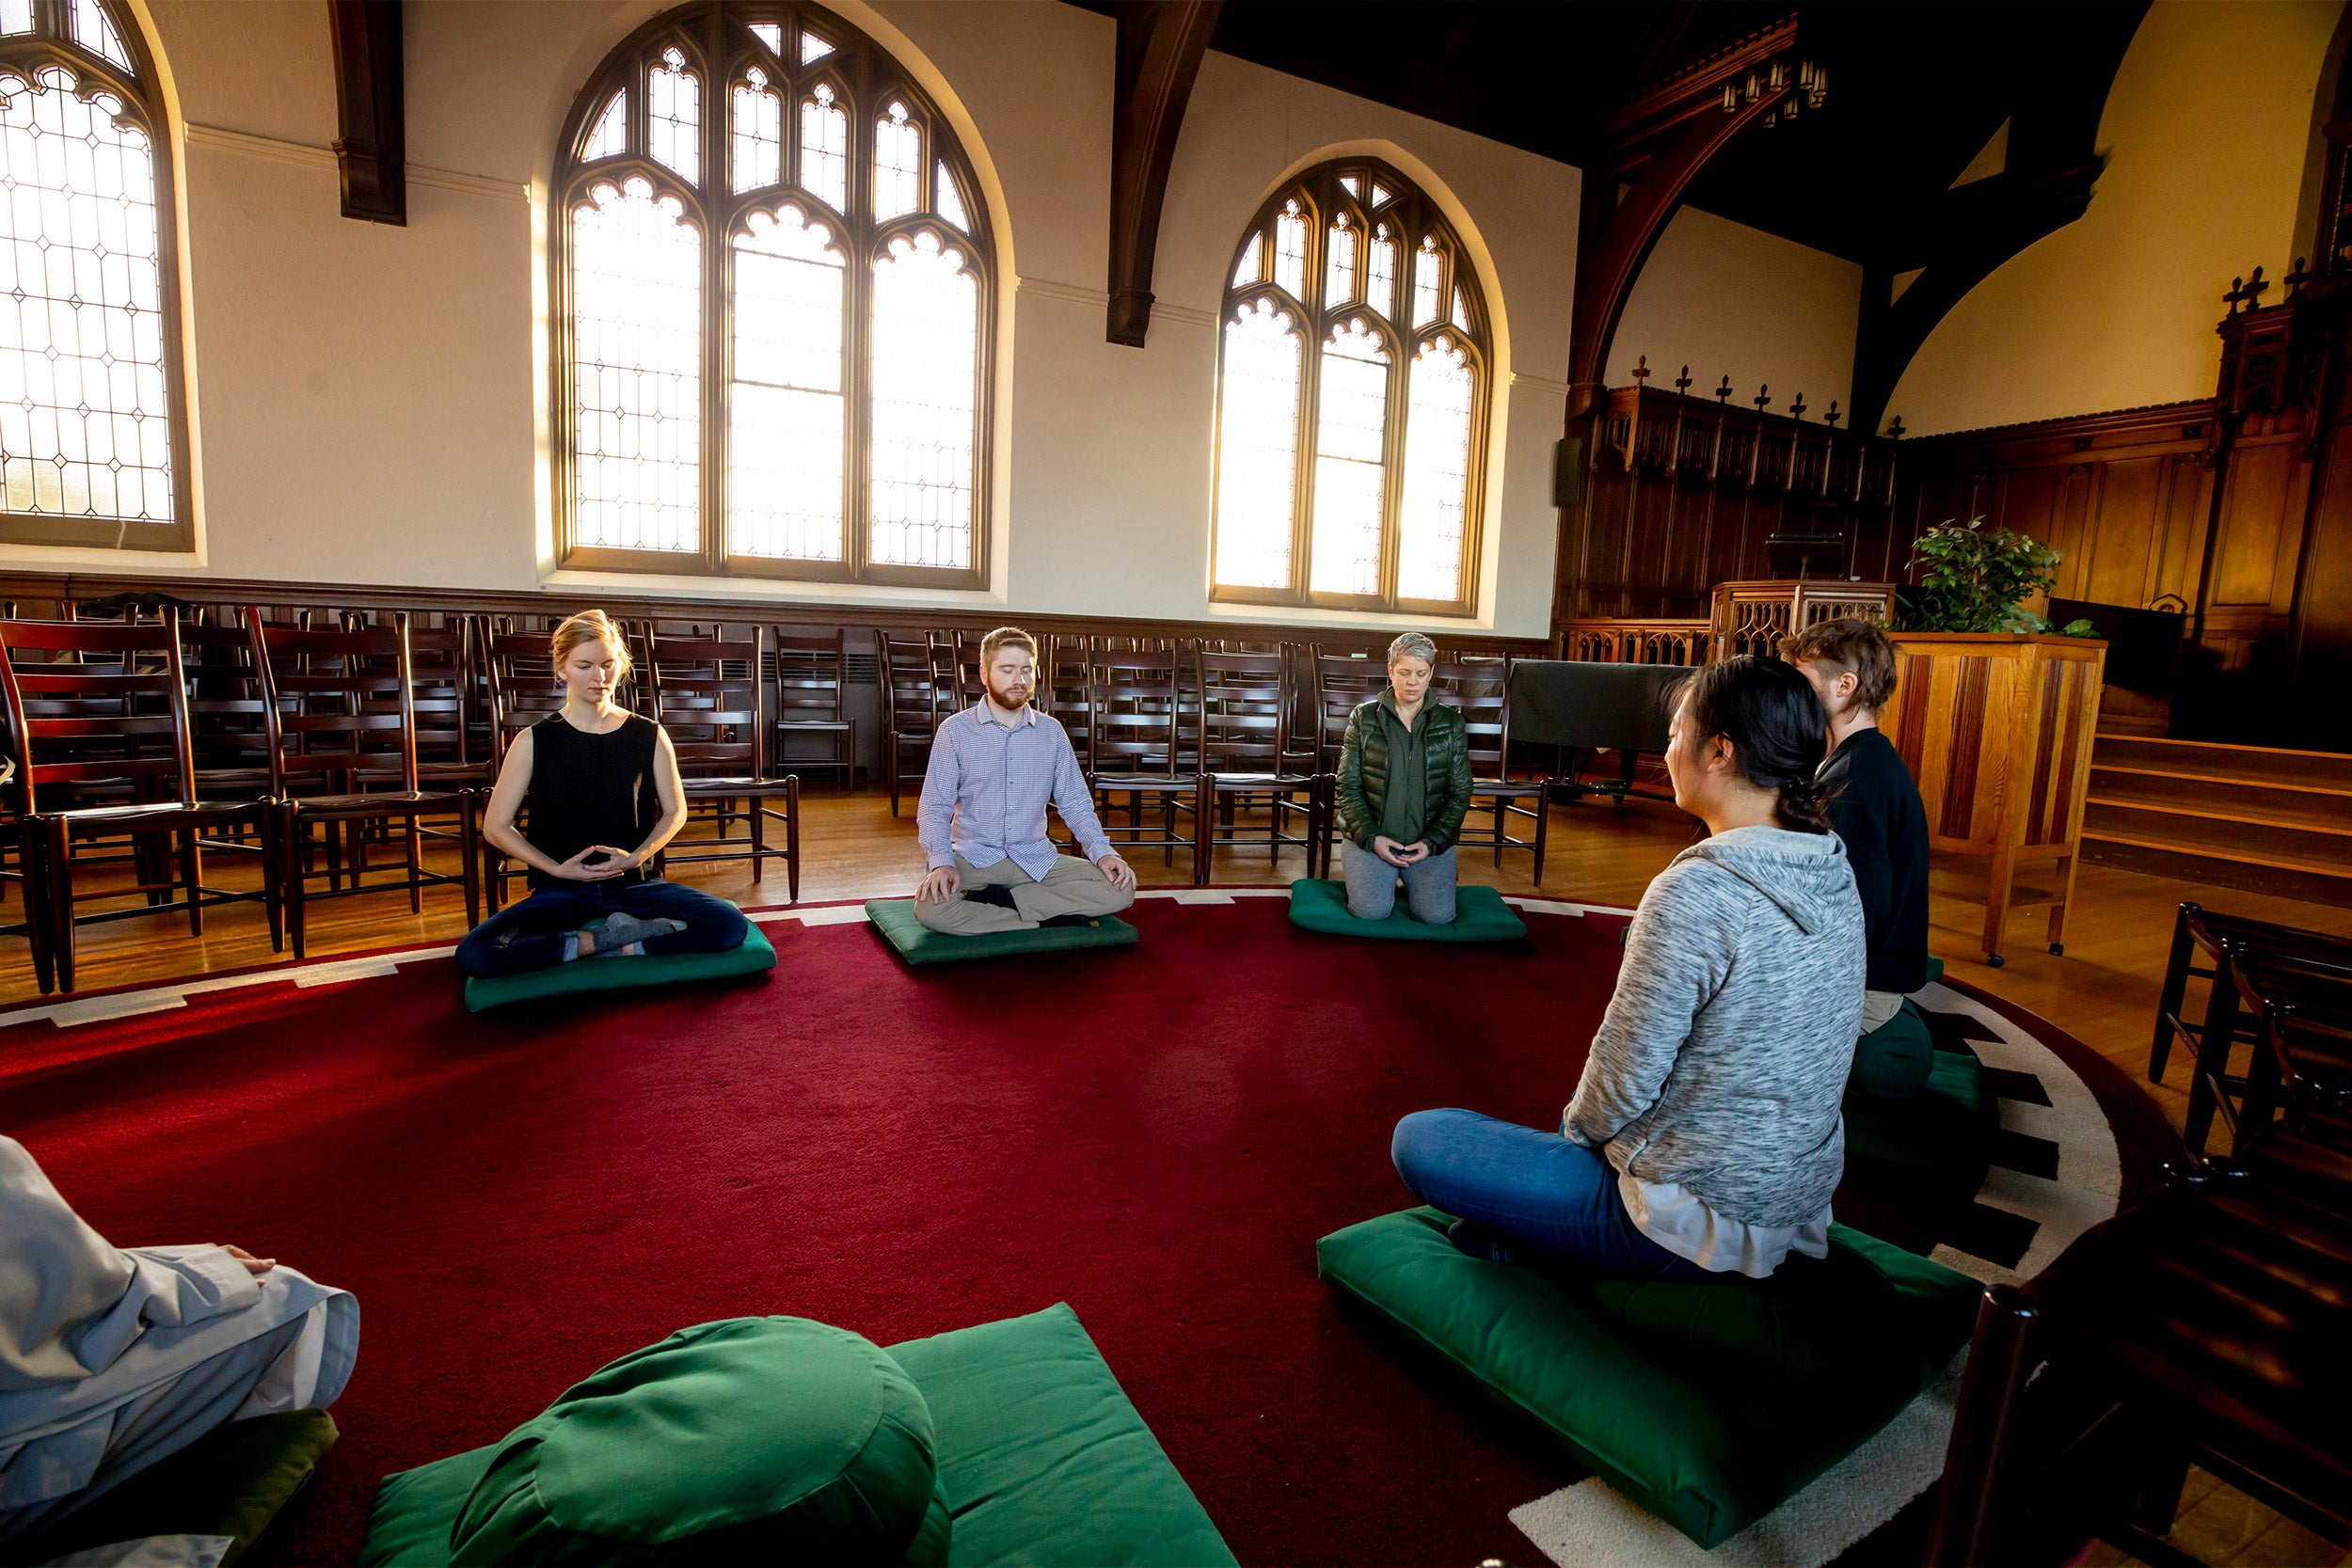 Meditation session at the Harvard Divinity School